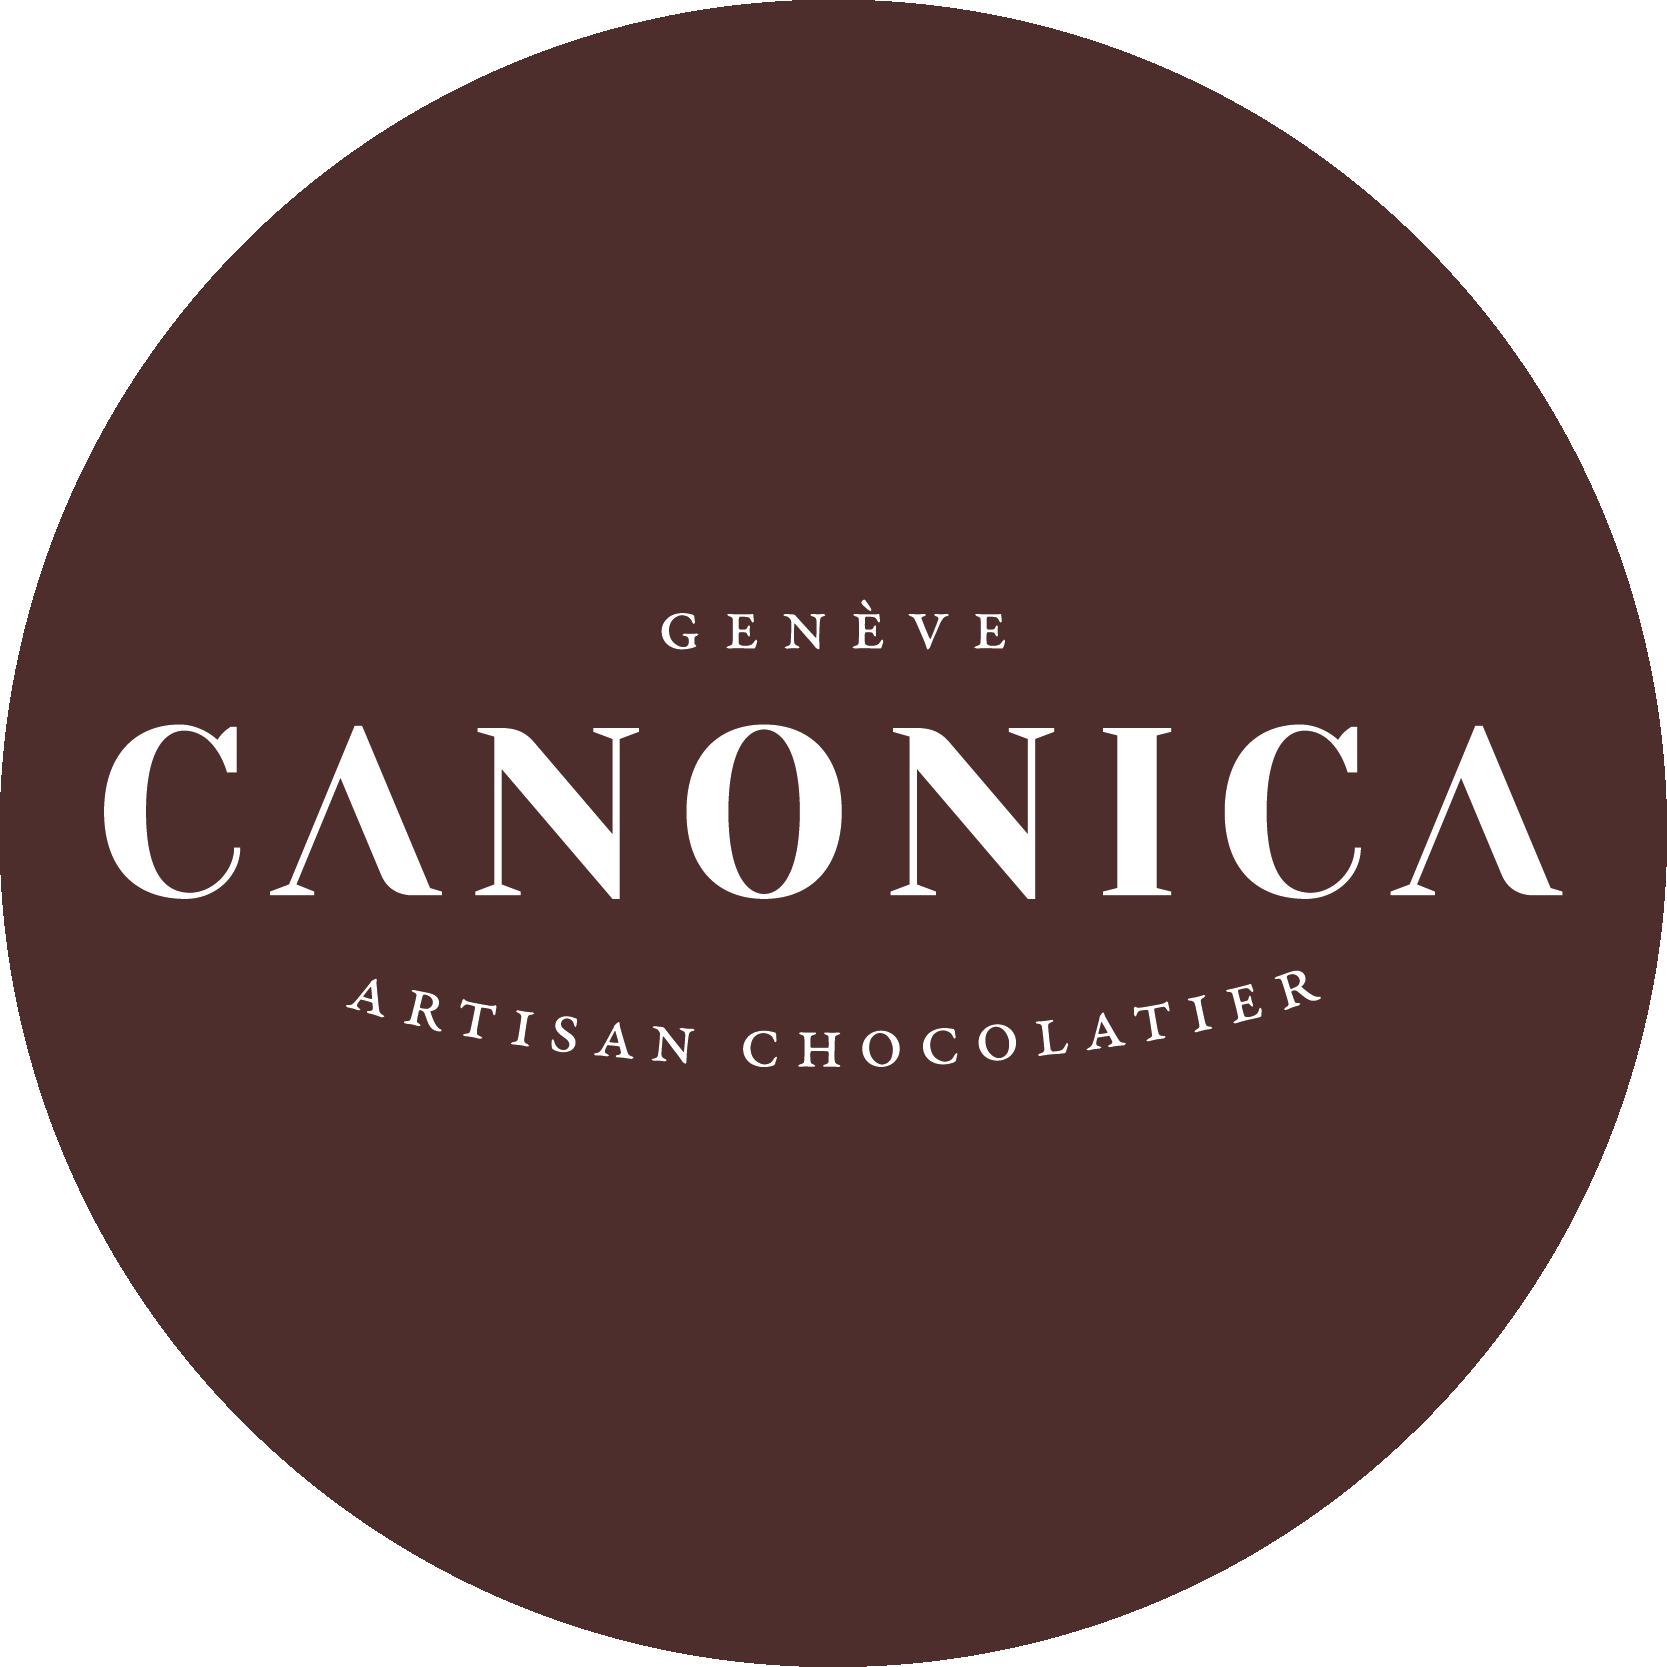 Canonica Chocolatier